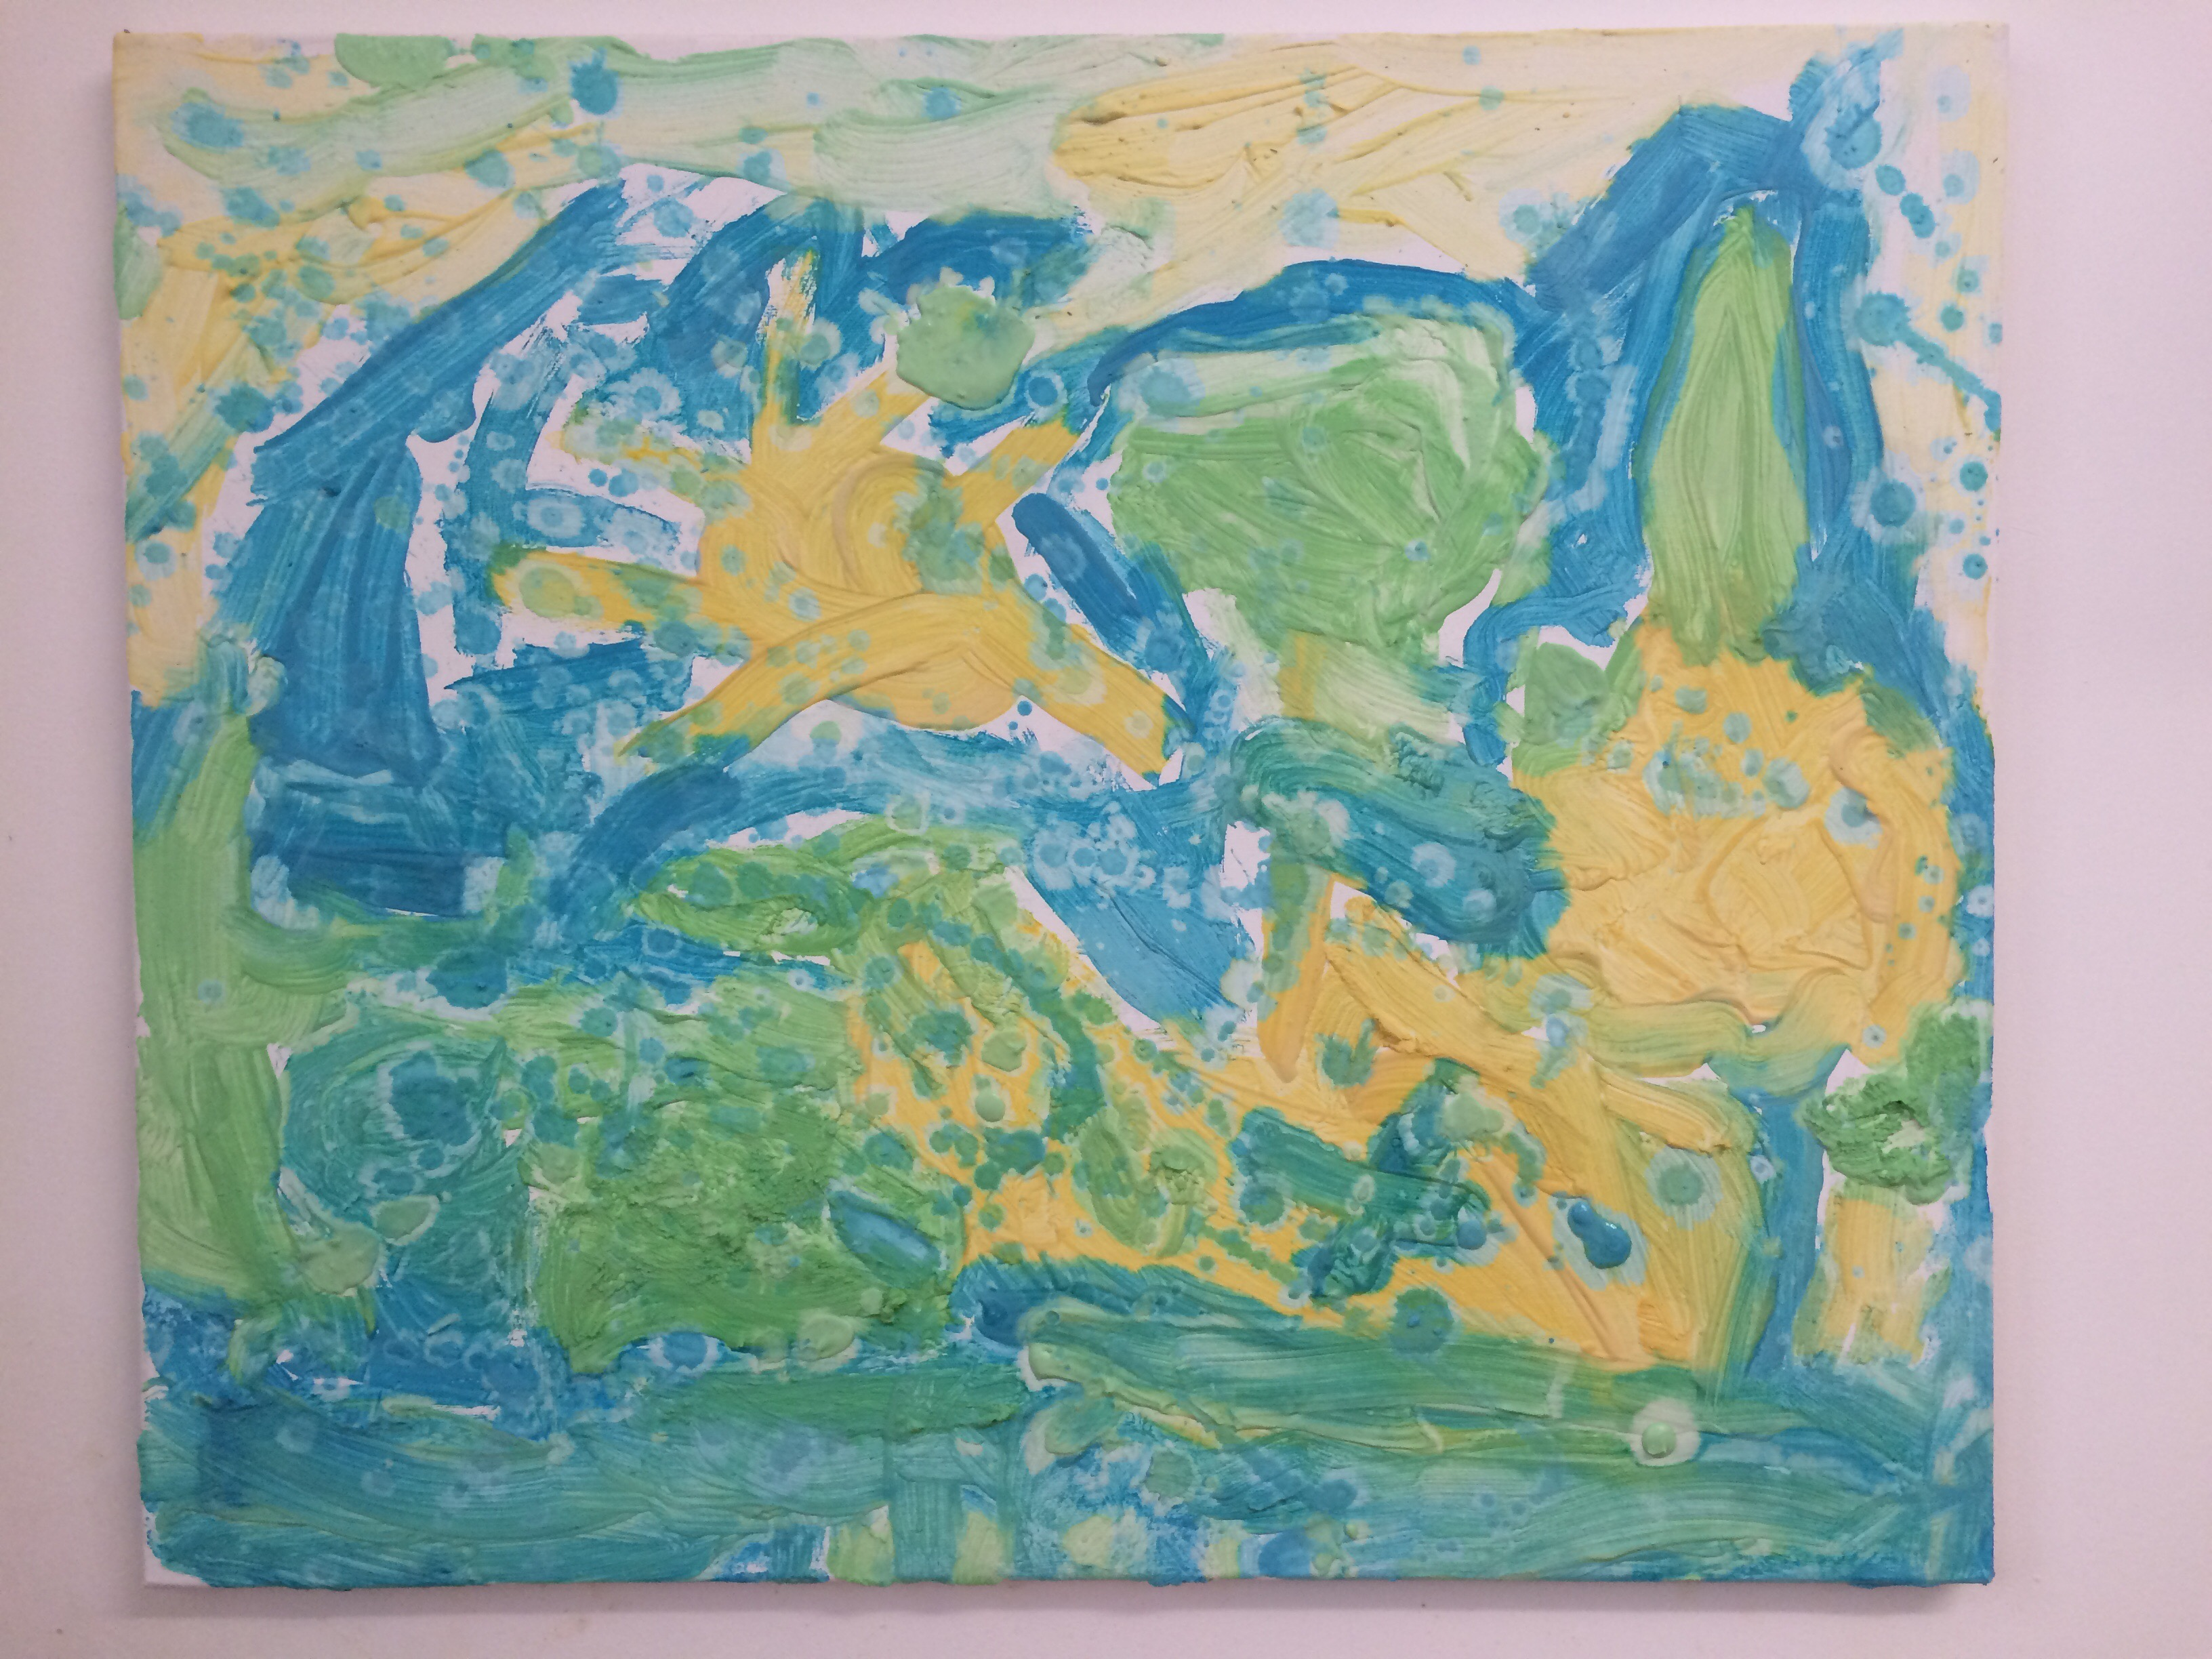 Plaster of Paris Painting – The Real Lara Shoe